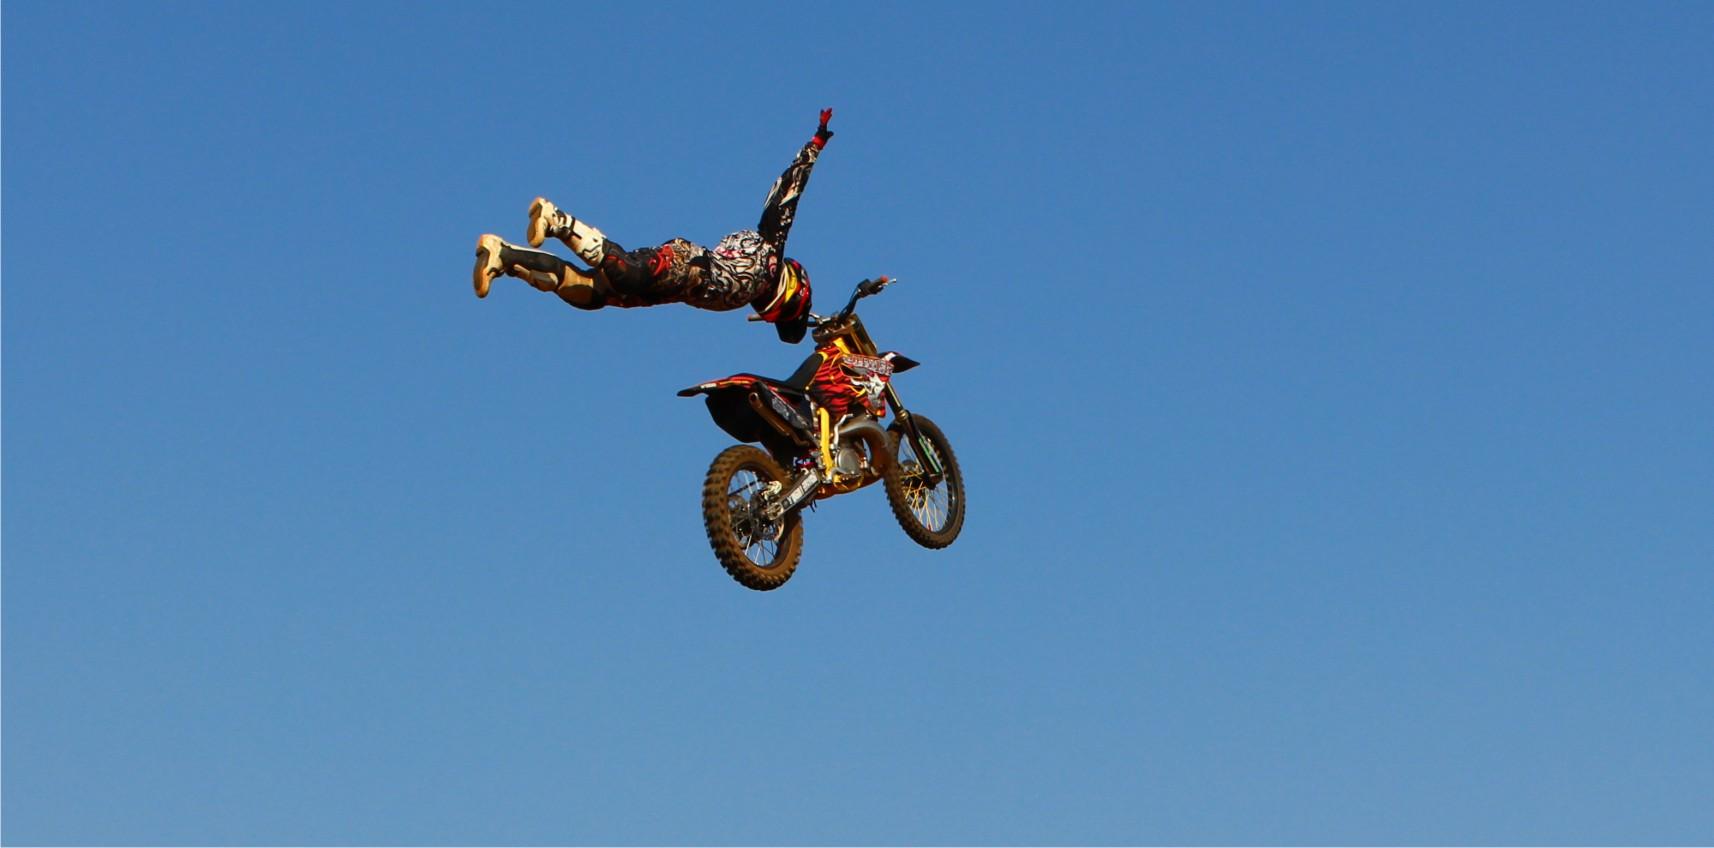 Alastair Sayer Freestyle Motocross king